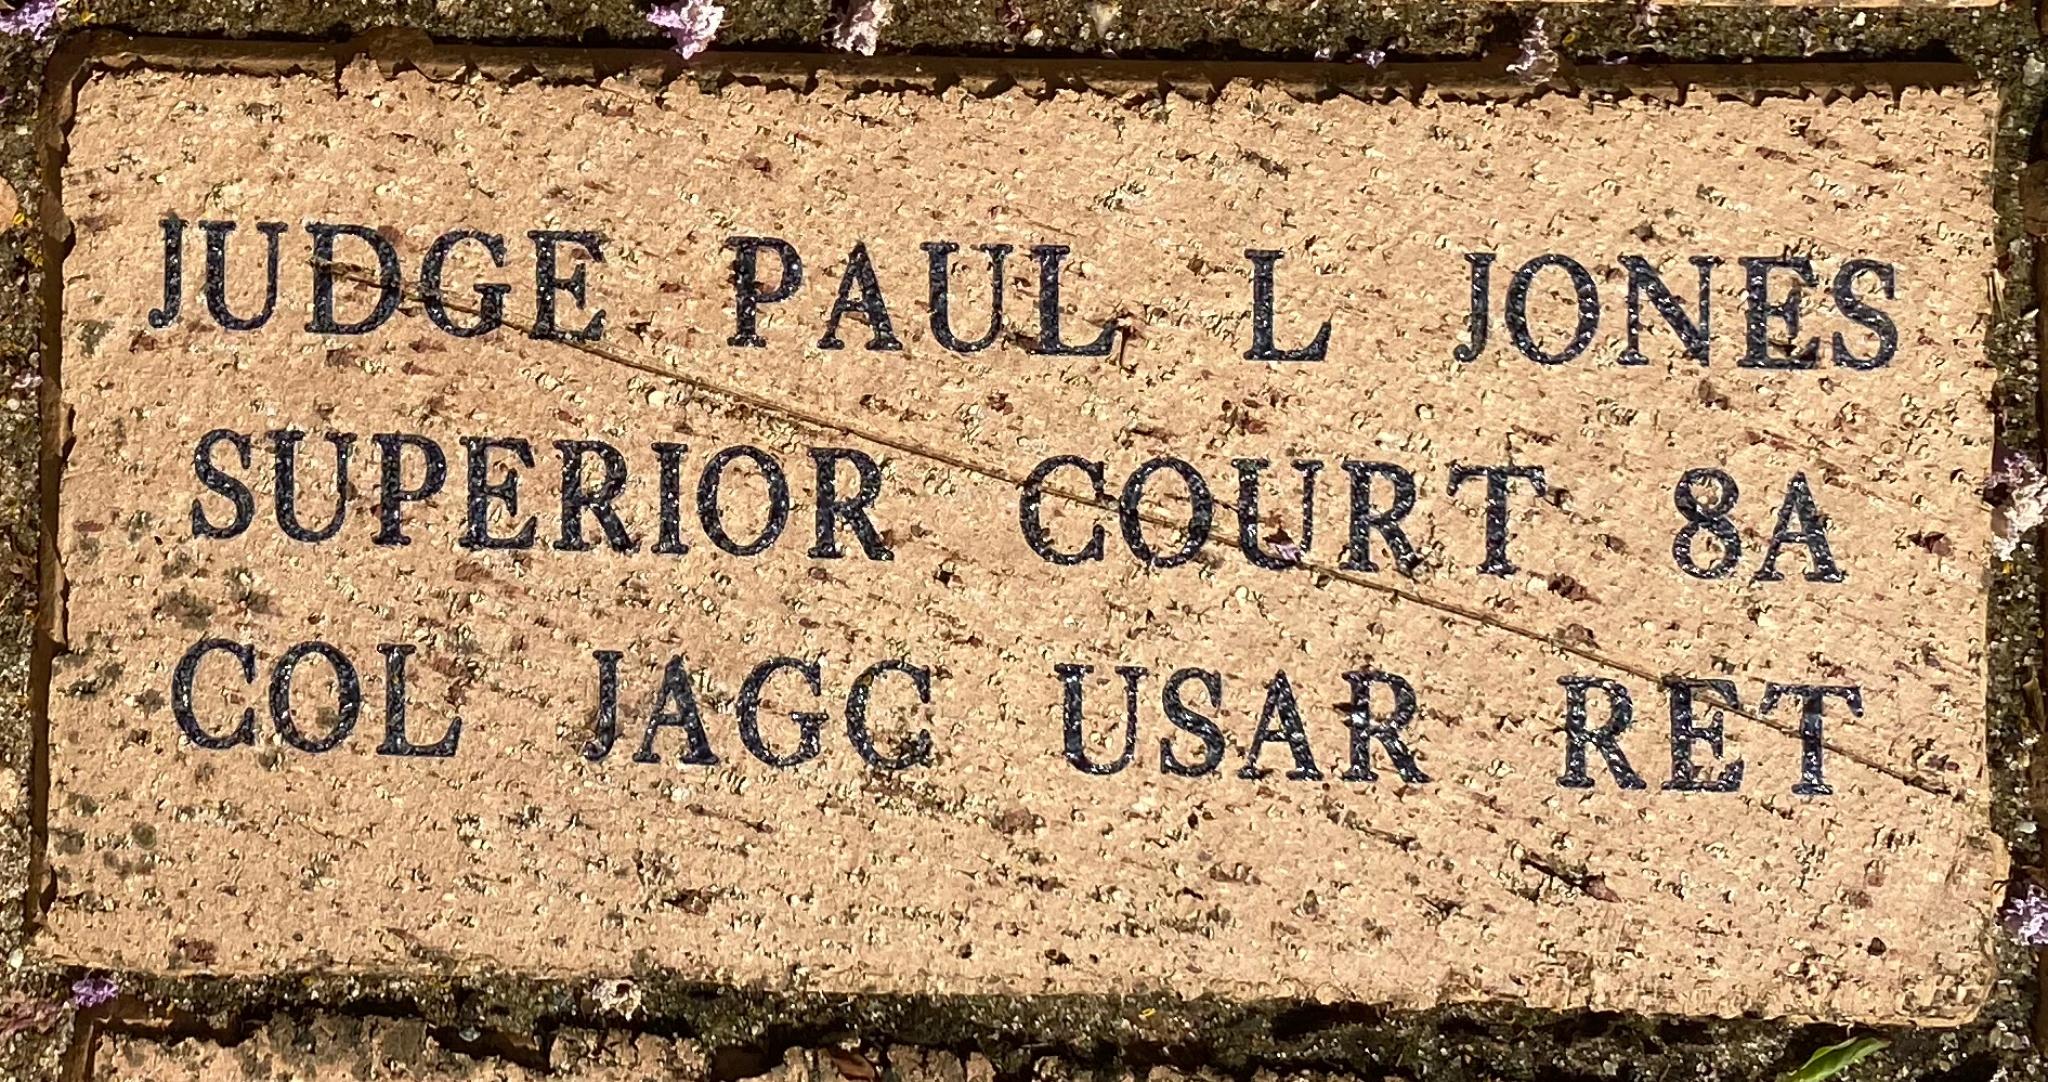 JUDGE PAUL L JONES SUPERIOR COURT 8A COL JAGC USAR RET